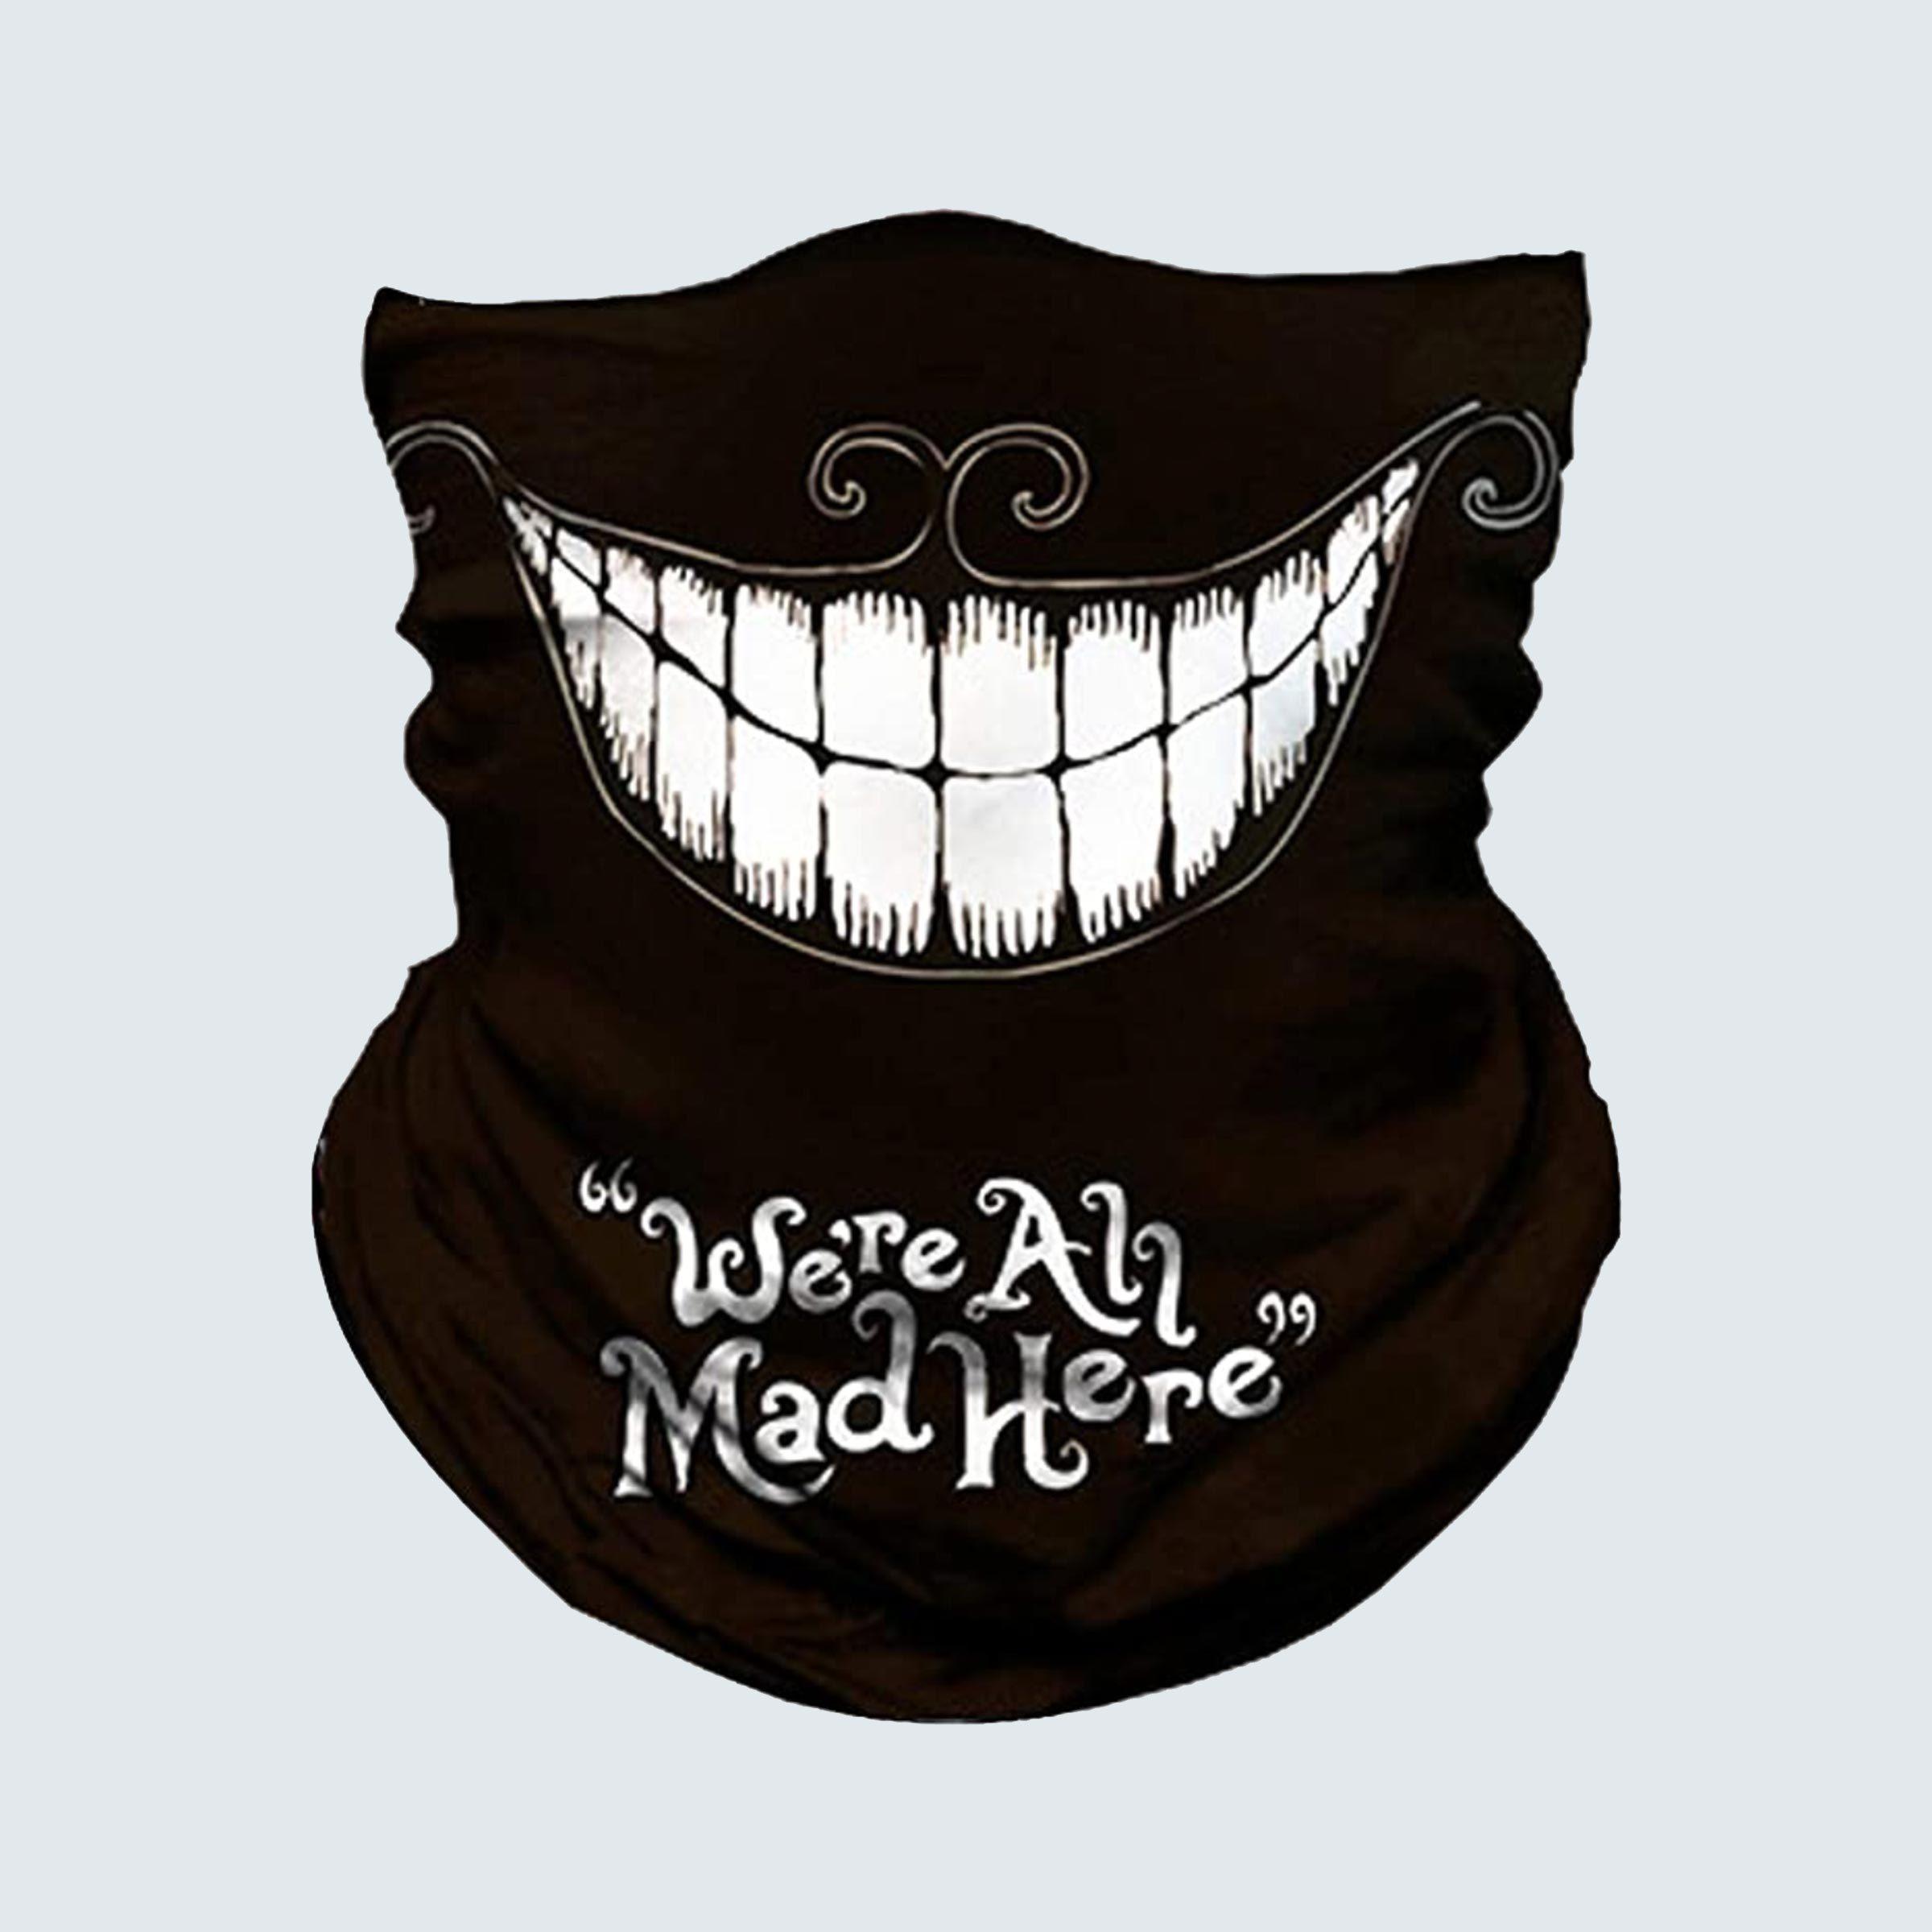 Mad Hatter face mask